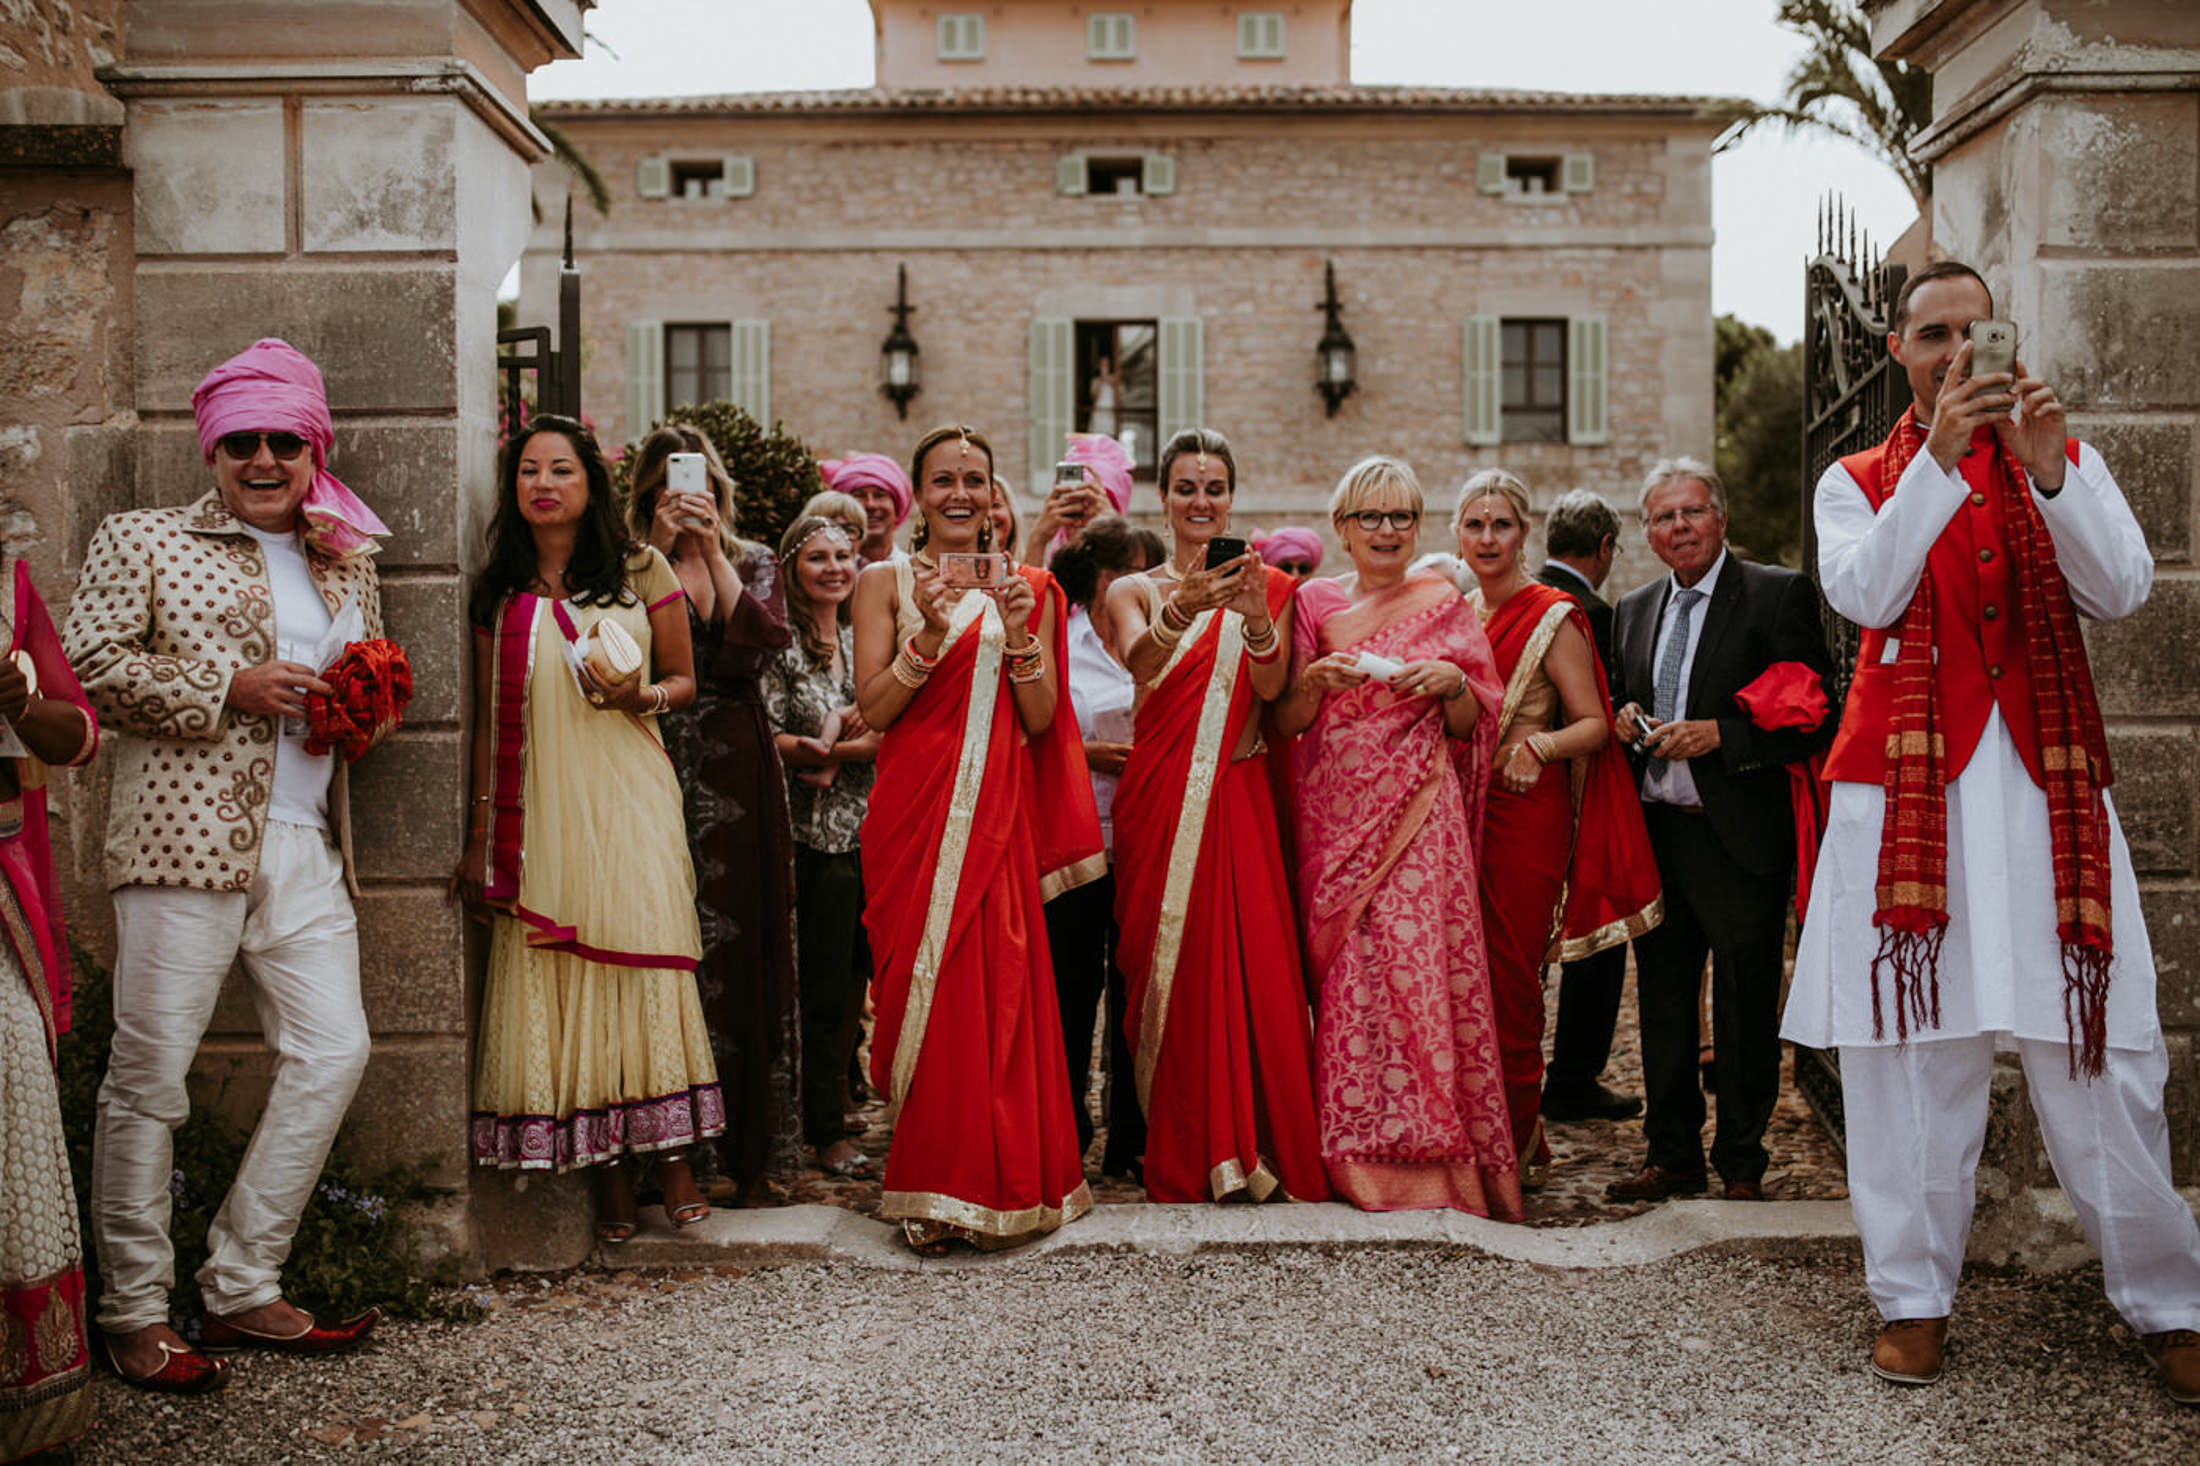 Wedding_Photographer_Mallorca_Daniela-Marquardt_Photography_New_York_Iceland_Tuscany_Santorini_Portugal_Austria_Bavaria_Elopement_Hochzeitsfotograf_AntjeRajat2_35